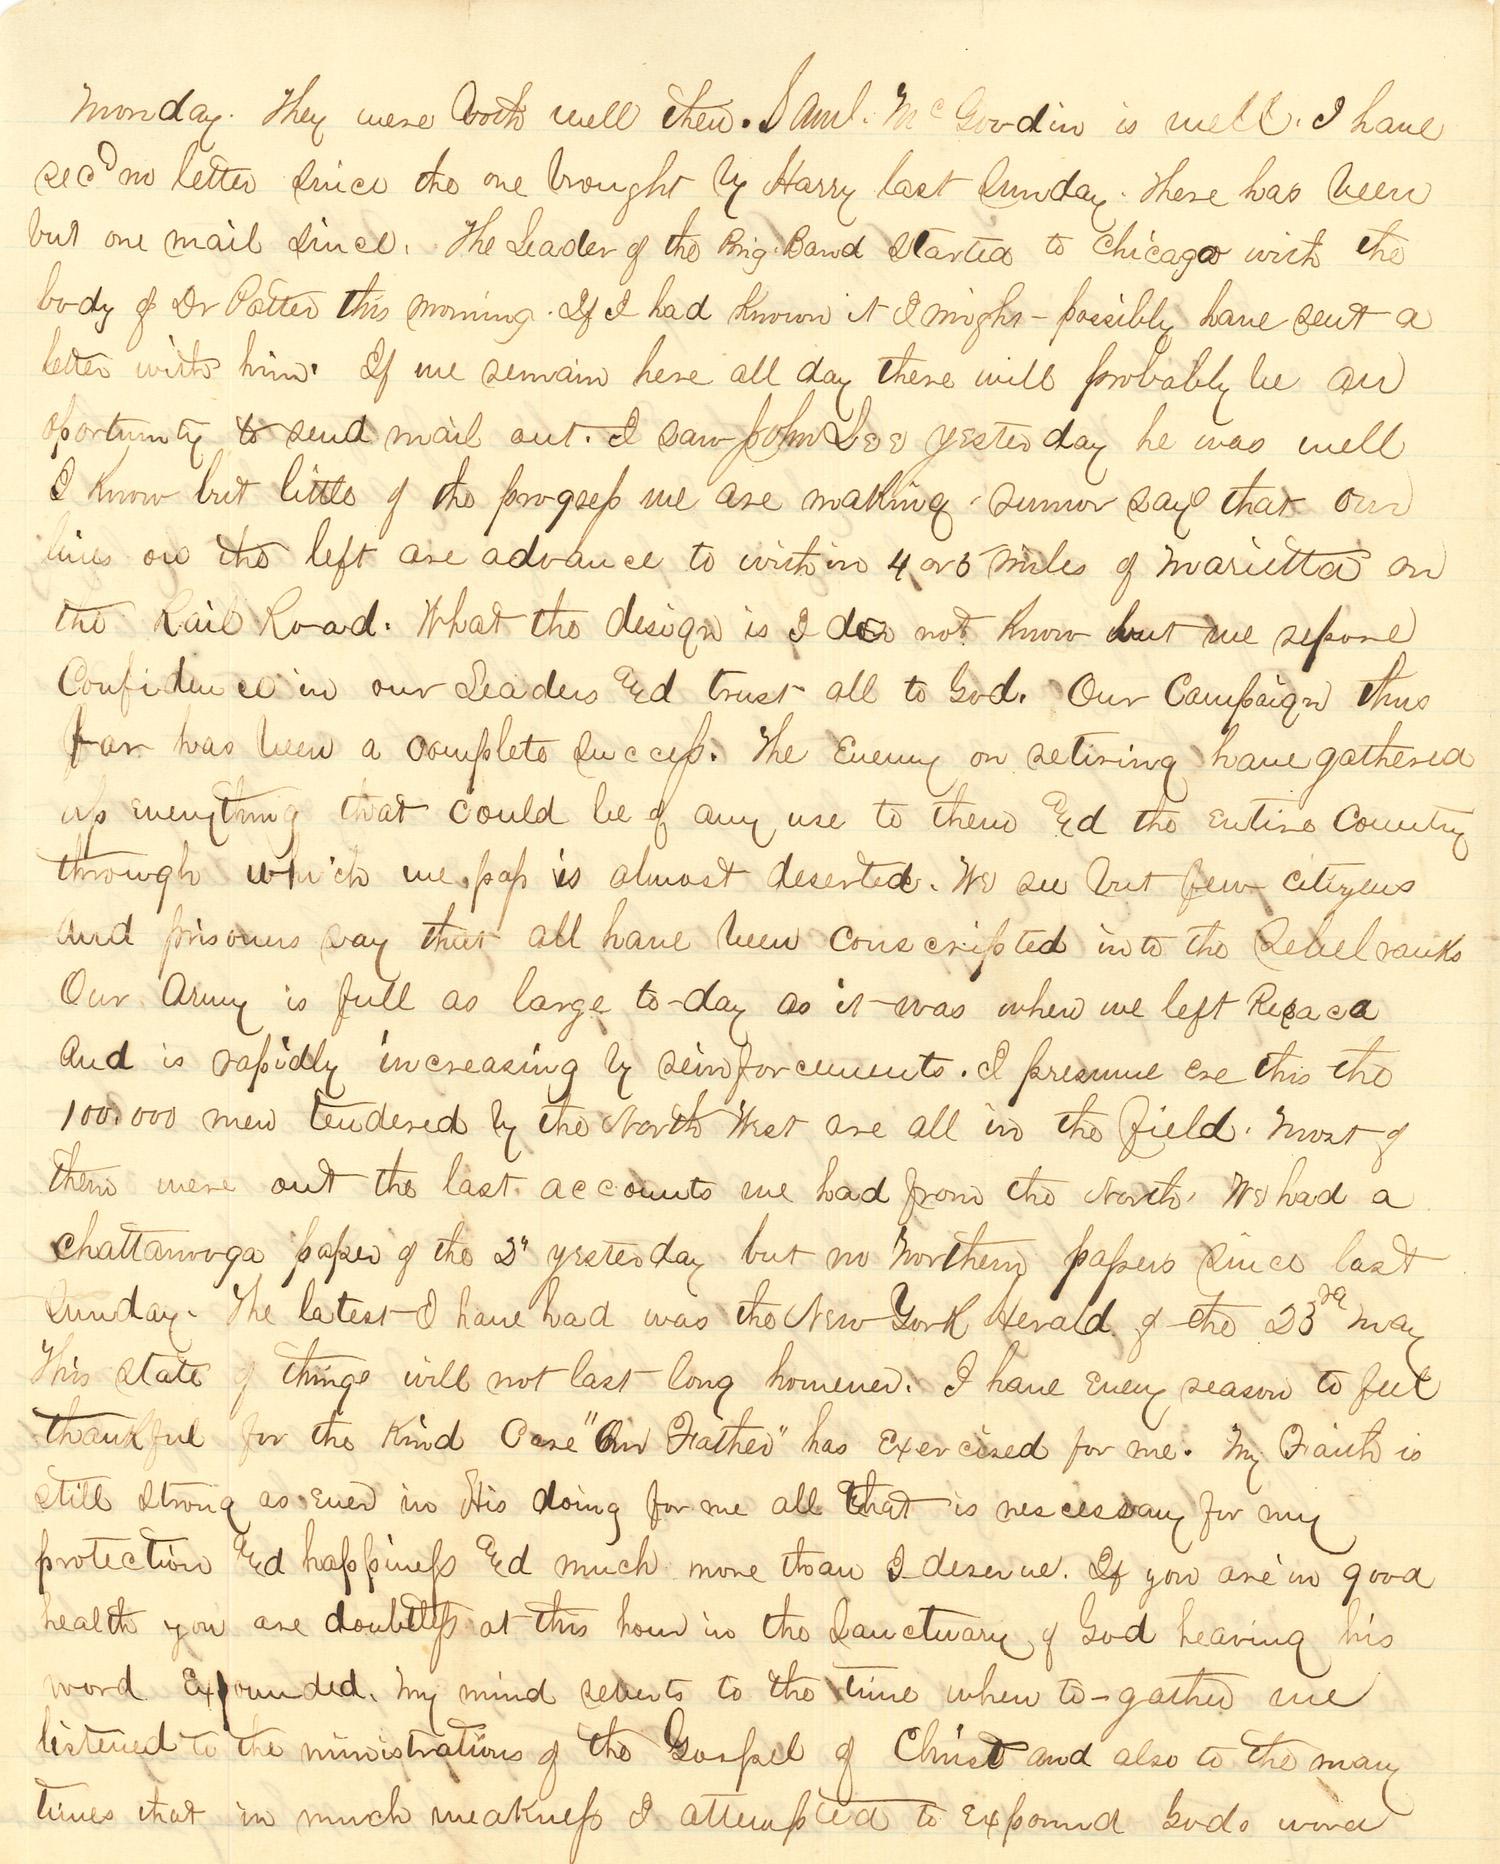 Joseph Culver Letter, June 5, 1864, Page 2